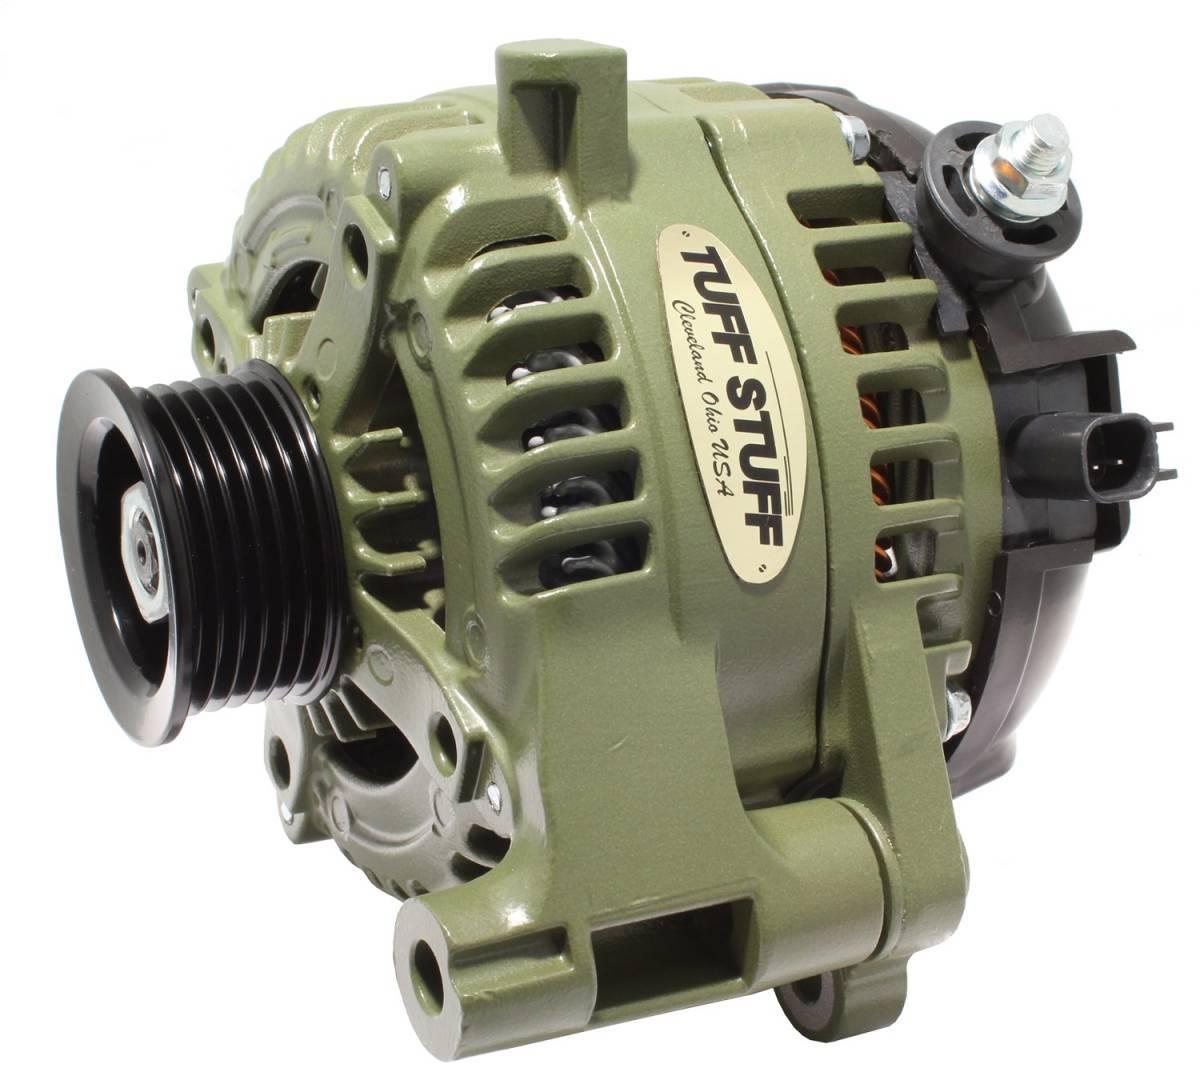 Tuff-Stuff 7514G Alternator, 175 amp, 12V, External Regulator, 6 Rib Serpentine Pulley, Army Green, Jeep Wrangler JK 2012-18, Each